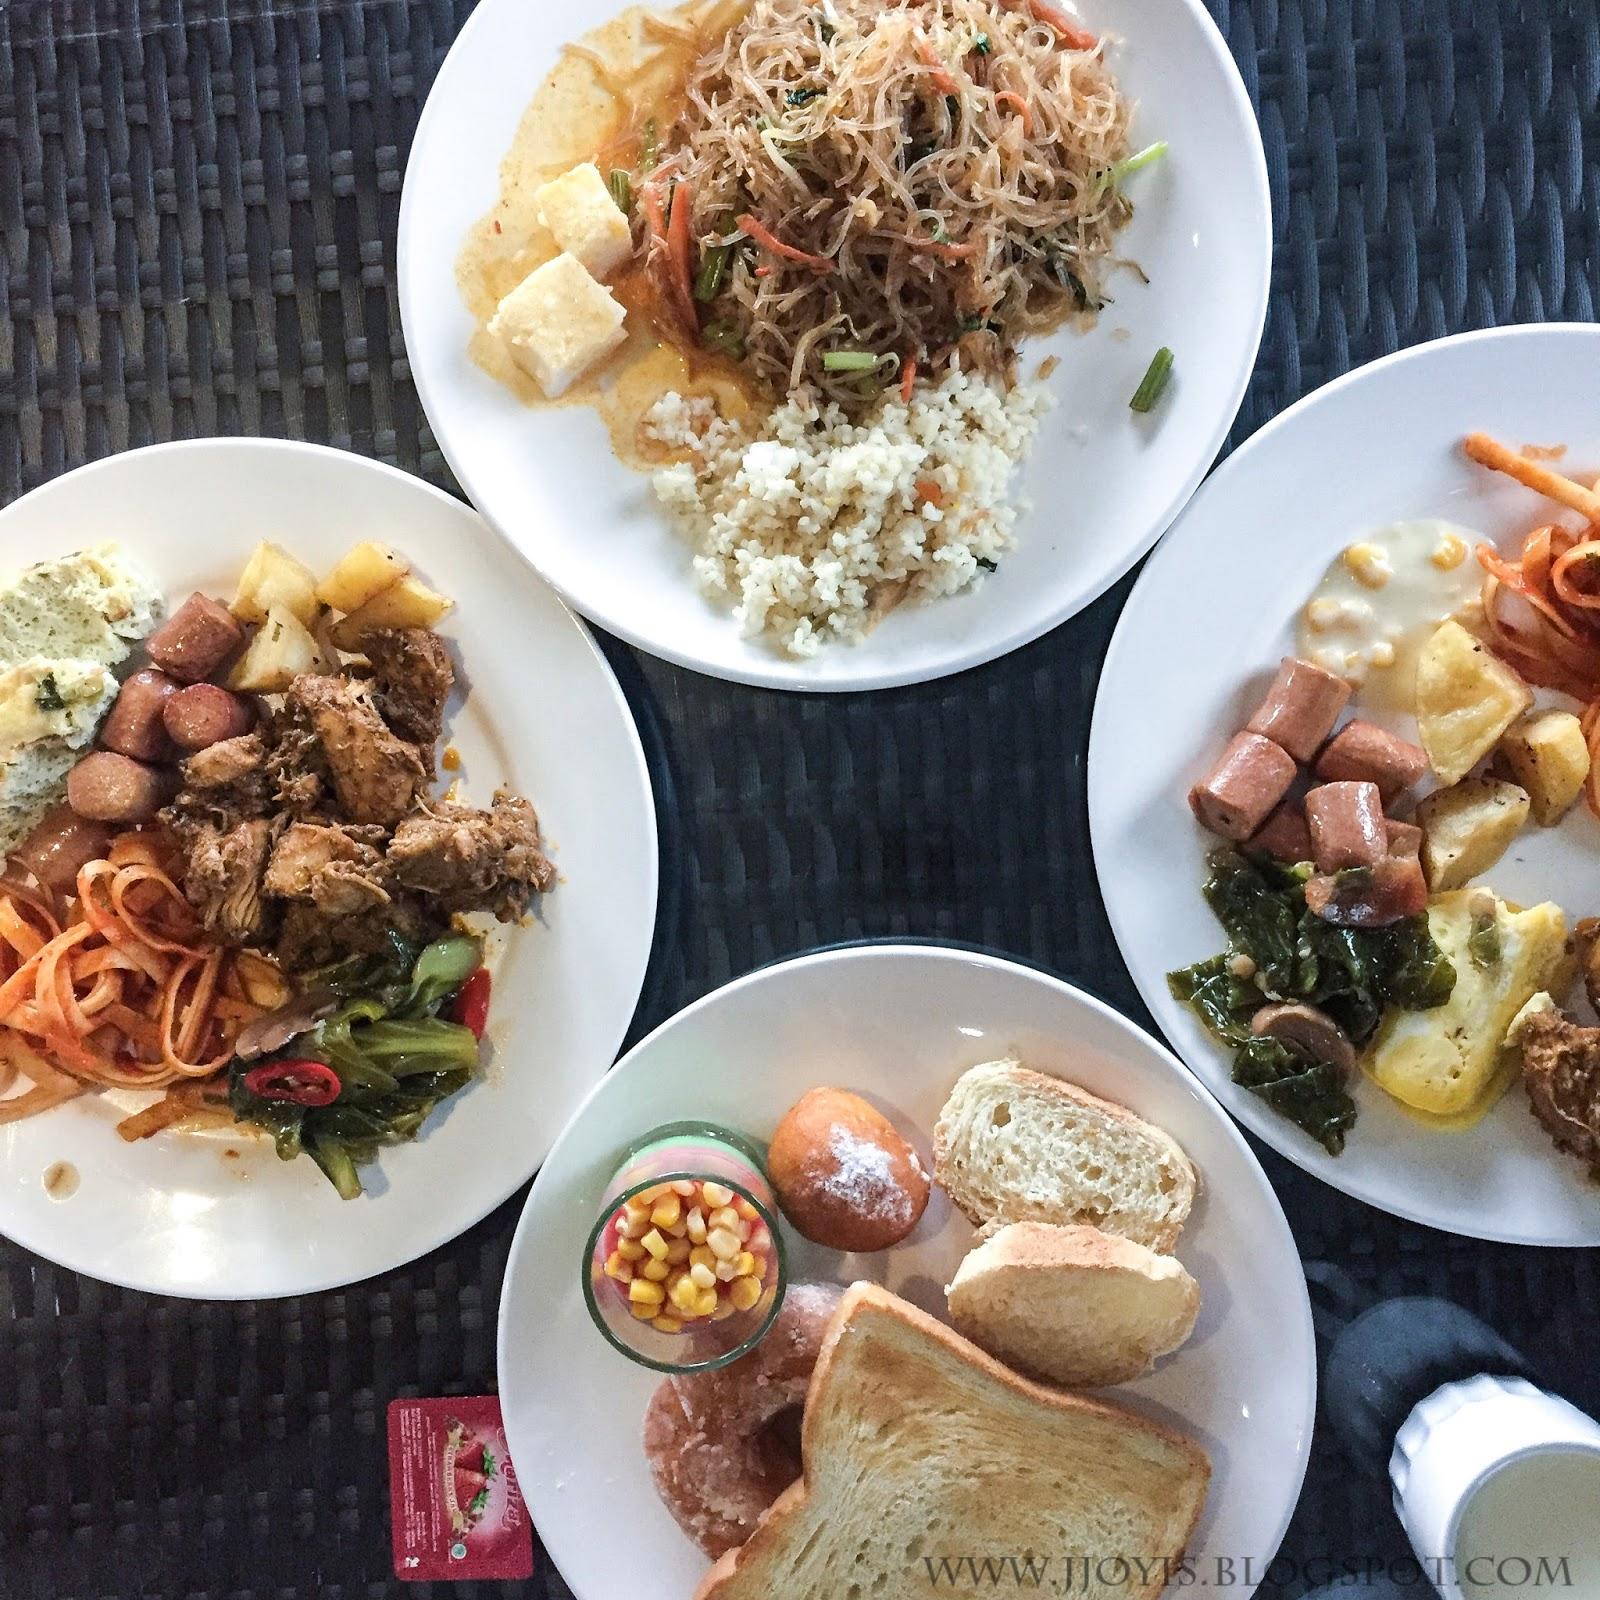 bcc hotel batam breakfast